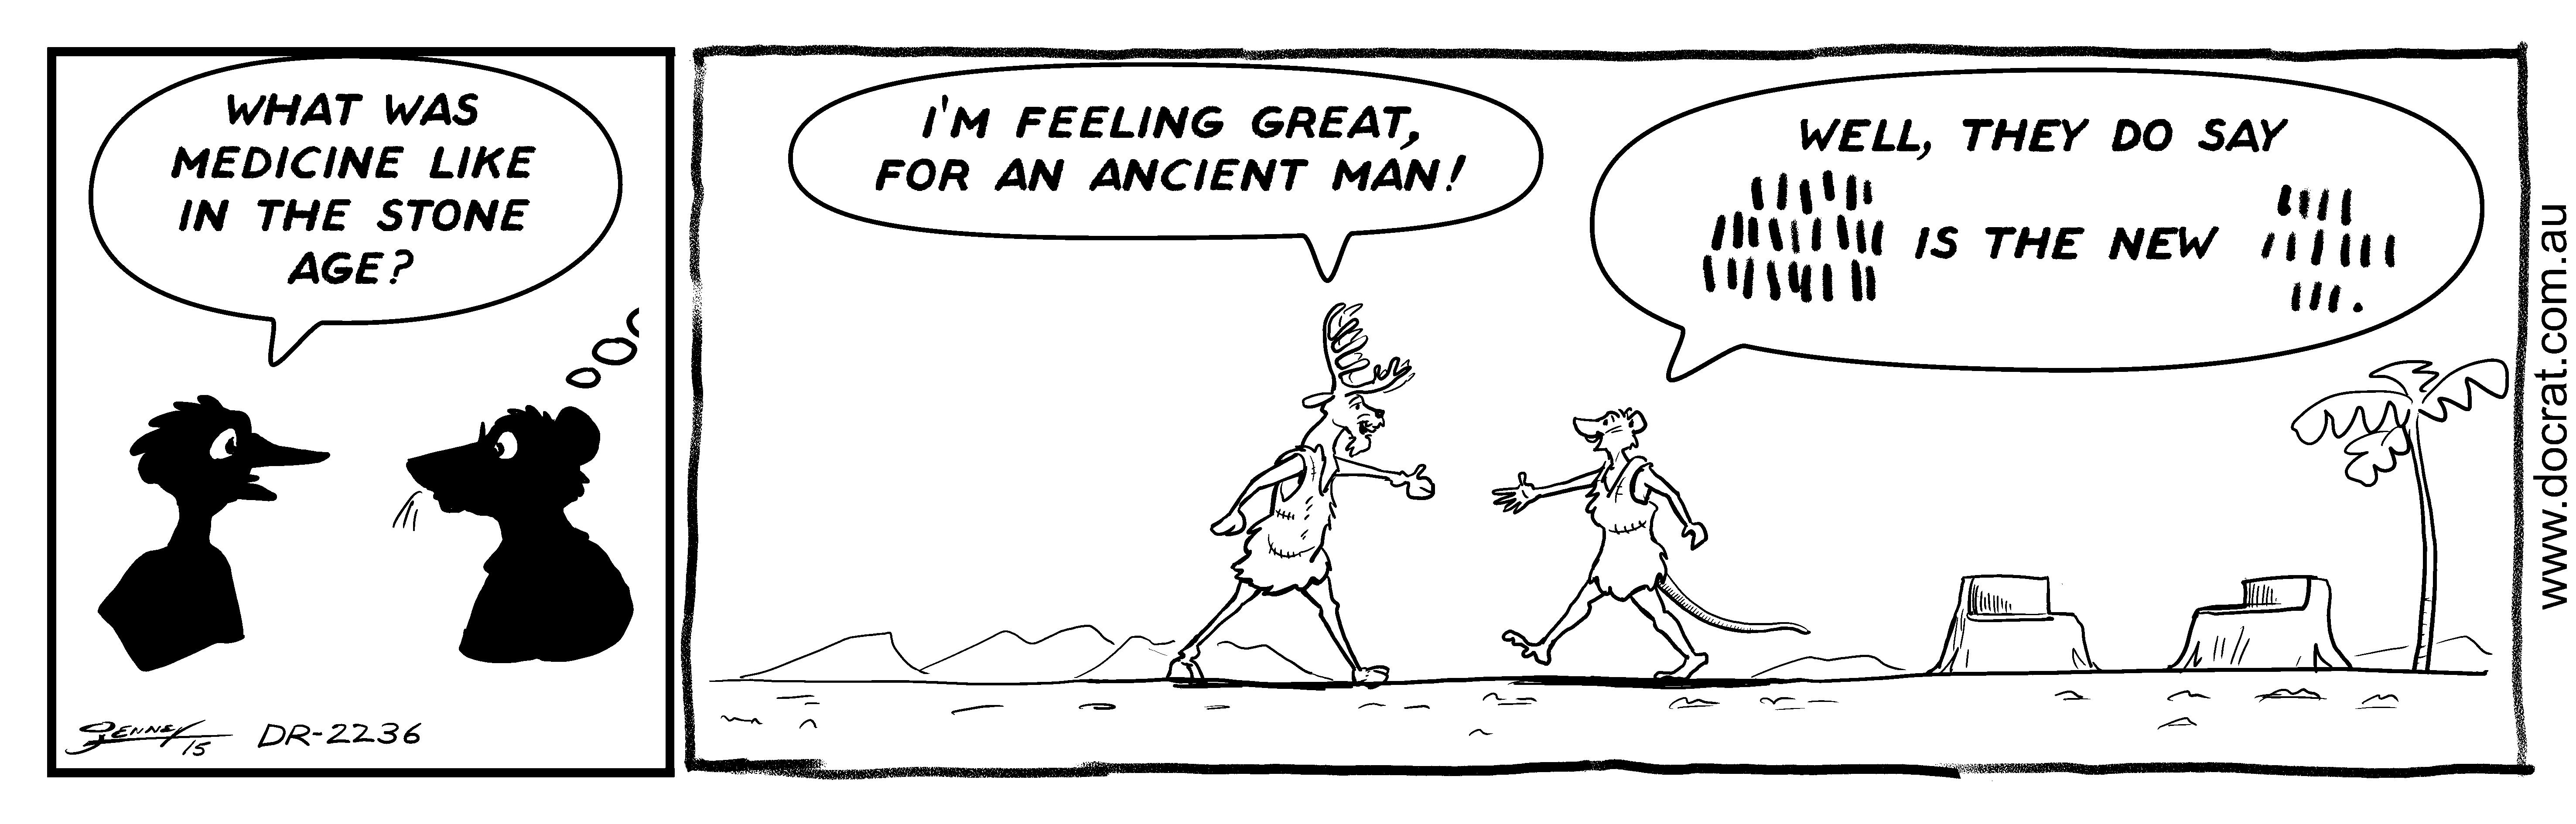 20150323